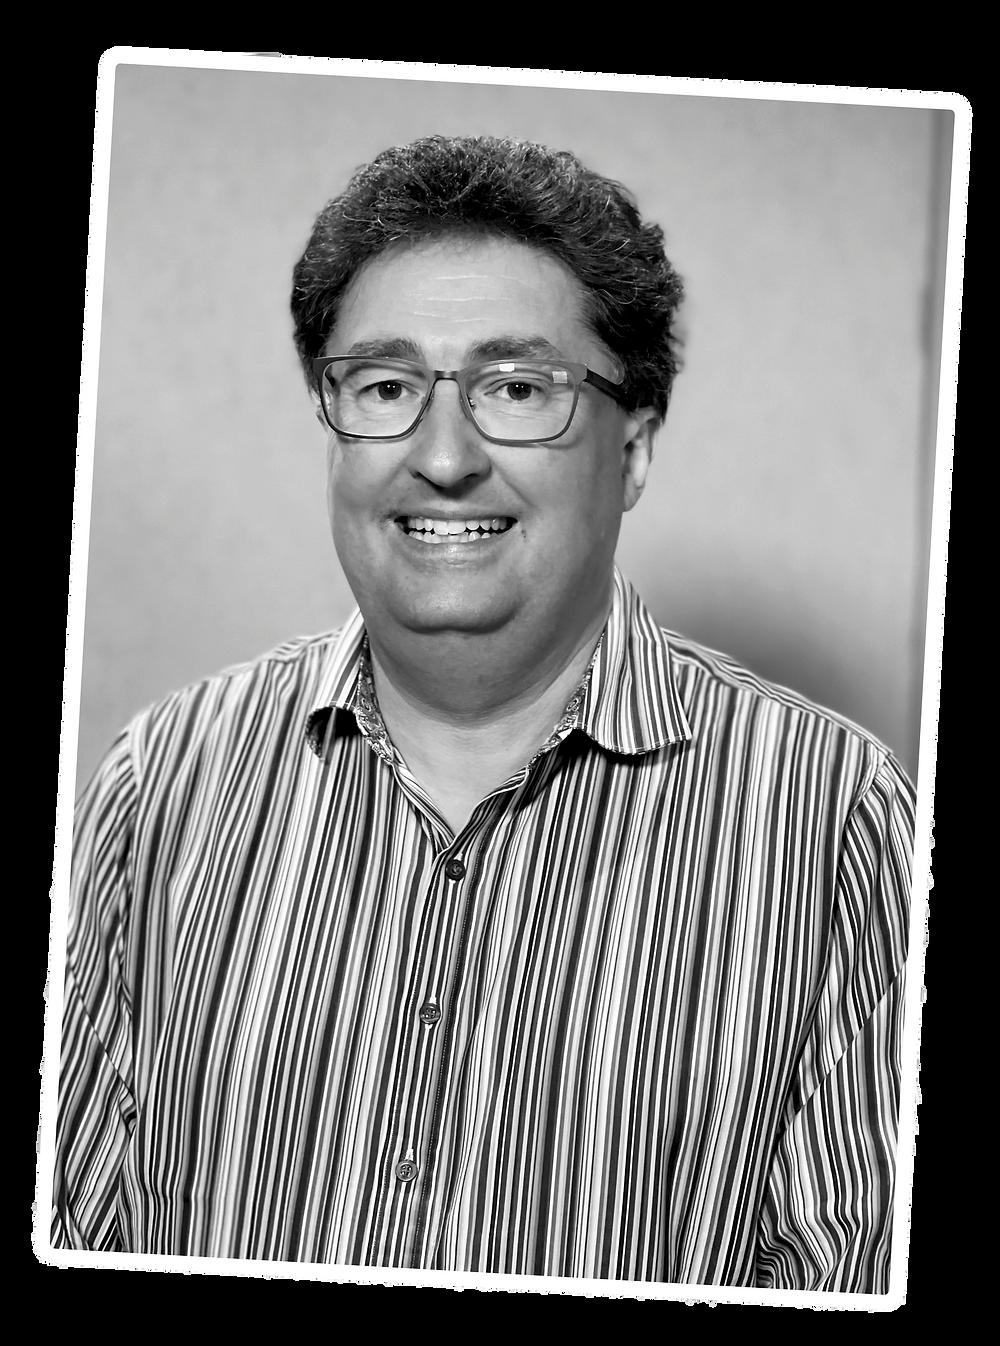 Mike Wroe, JL Live & JL Lighting Chairman